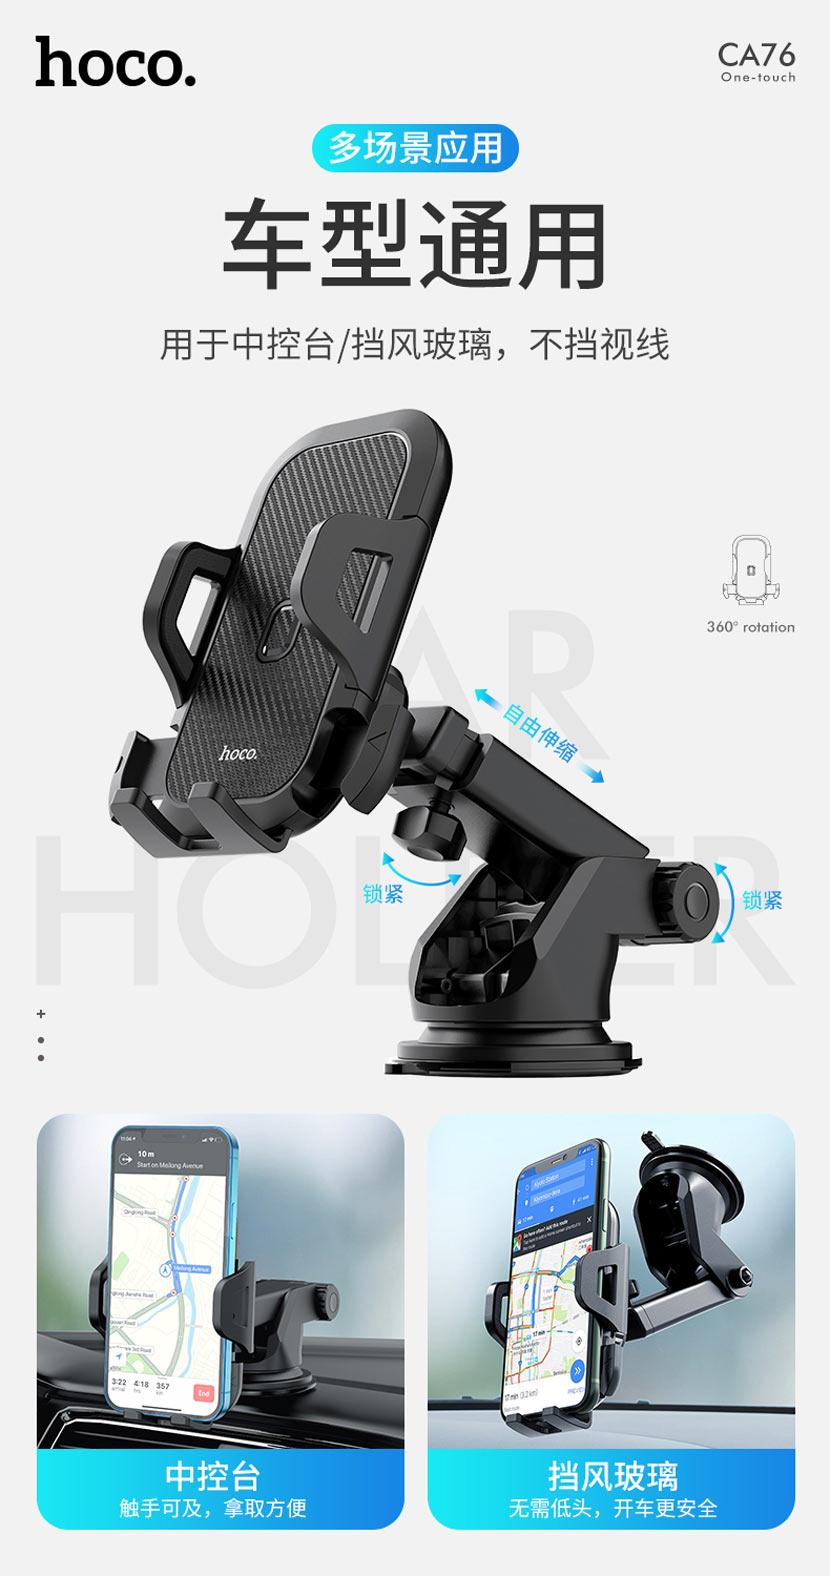 hoco news ca76 touareg one touch center console car holder universal cn